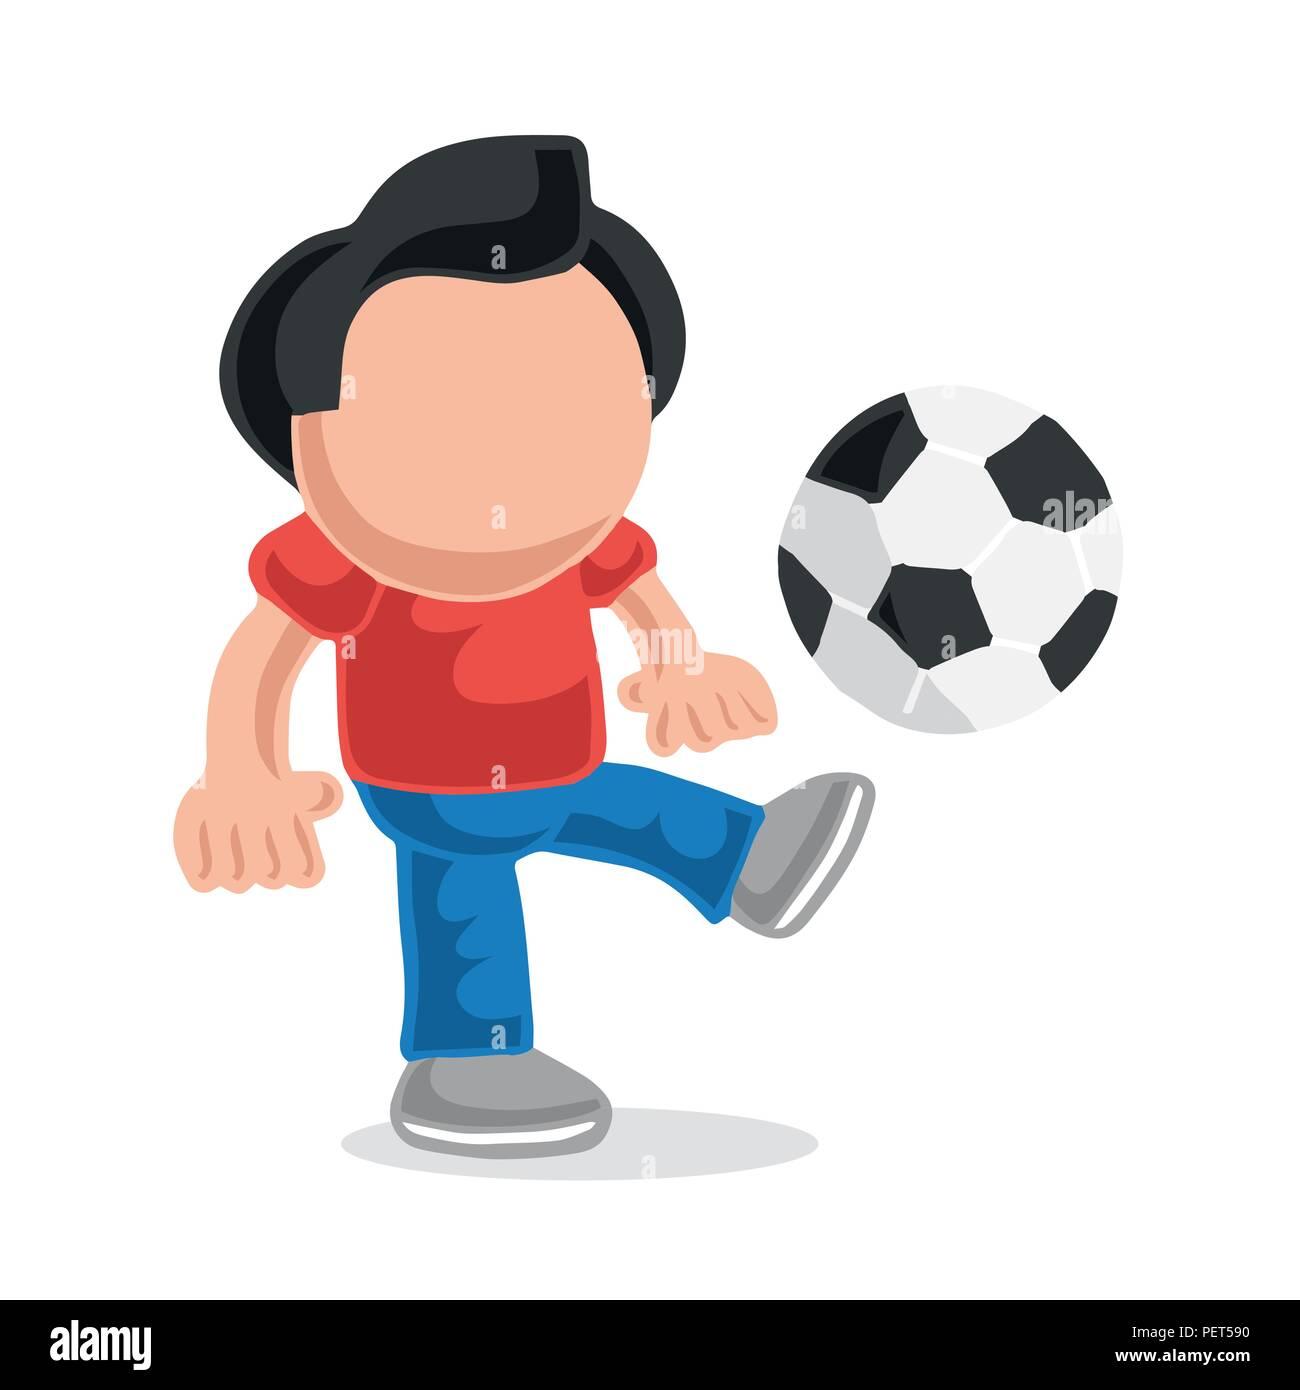 Vector hand-drawn cartoon illustration of man standing kicking playing soccer ball. - Stock Vector